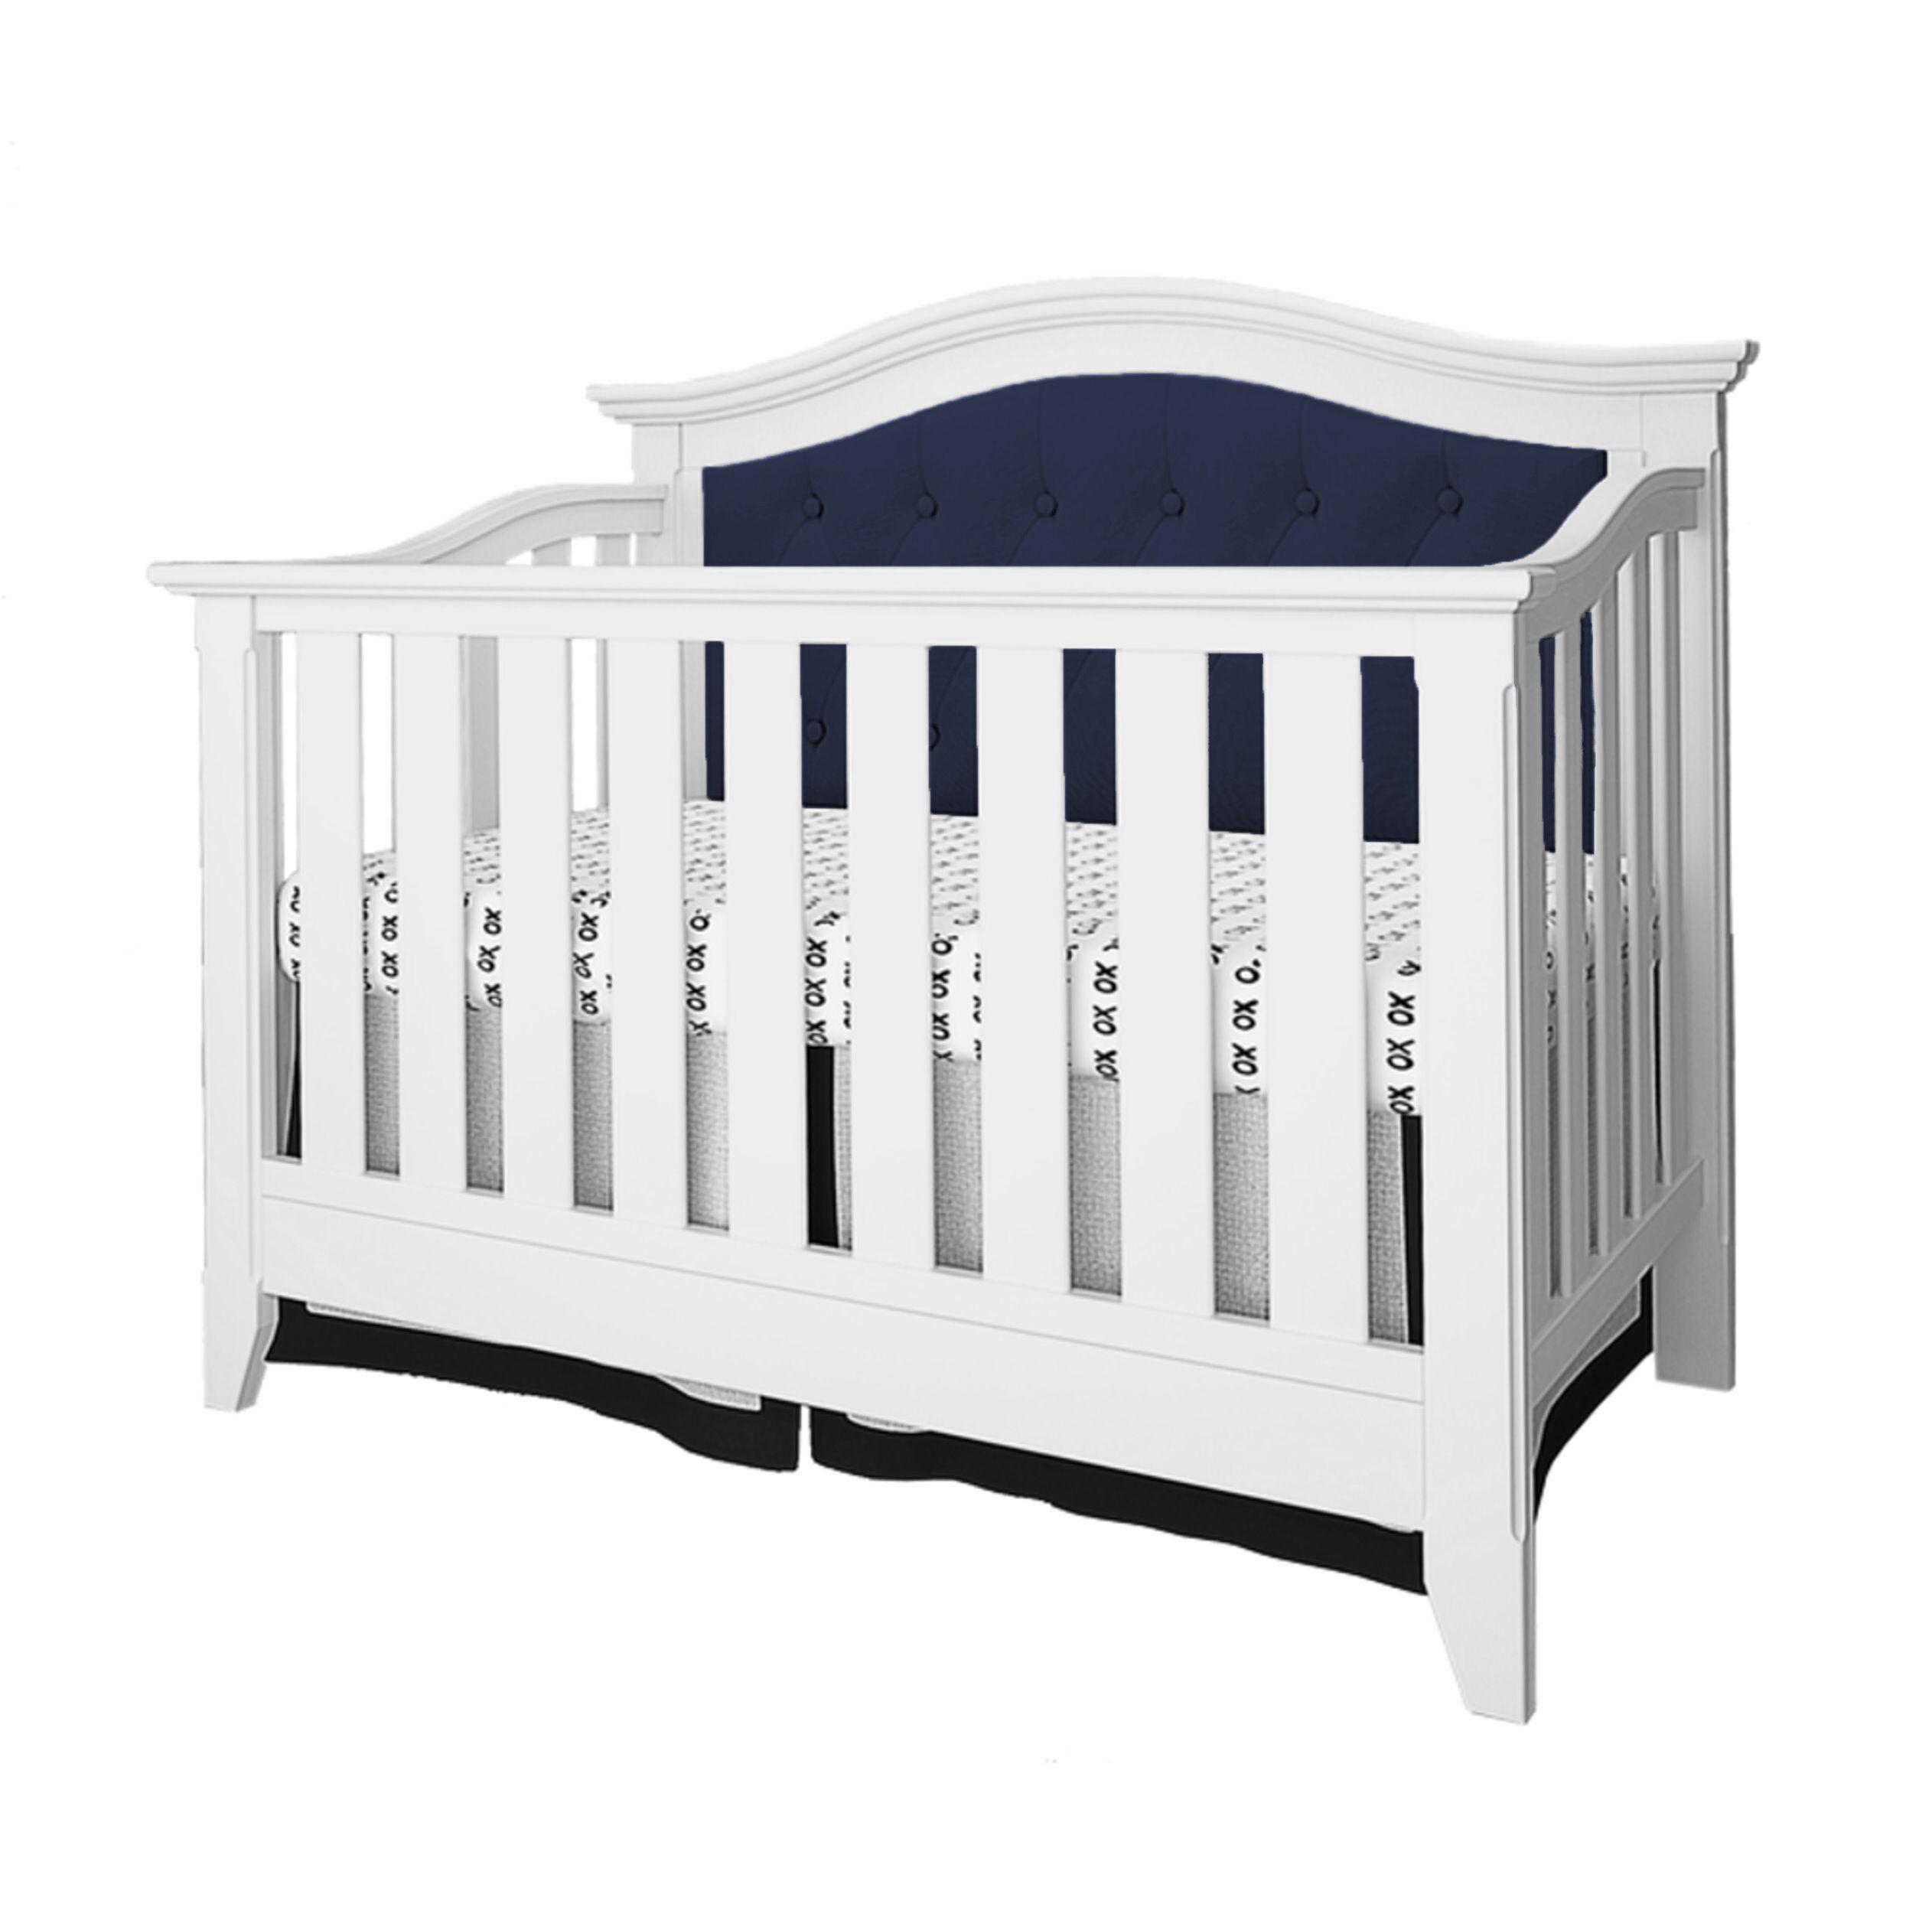 Belle Isle Furniture AAK14-0F01 Classic little ones nursery clean-lined crib, Dark Blue